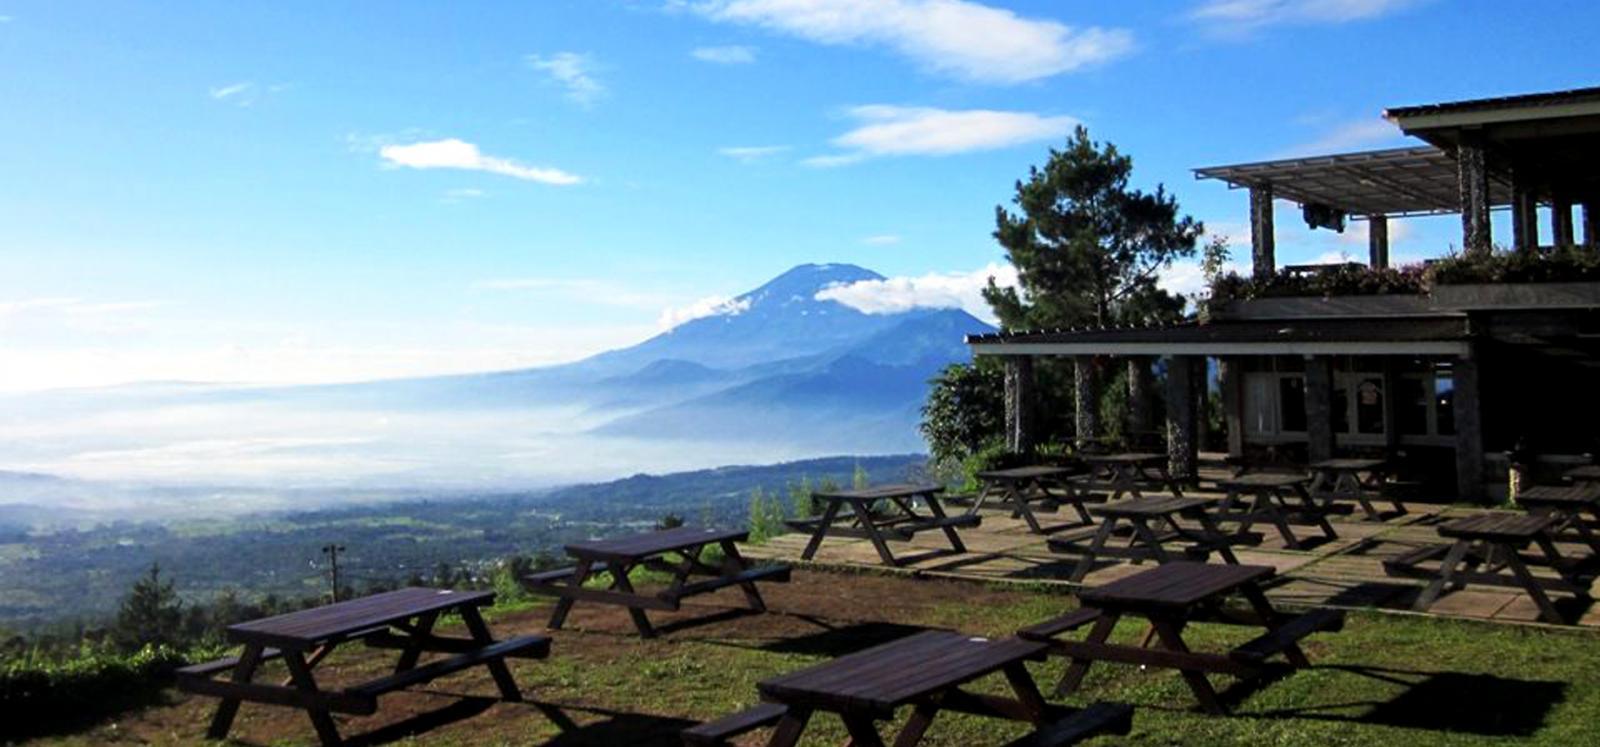 resorts in umbul sidomukti for honeymooners